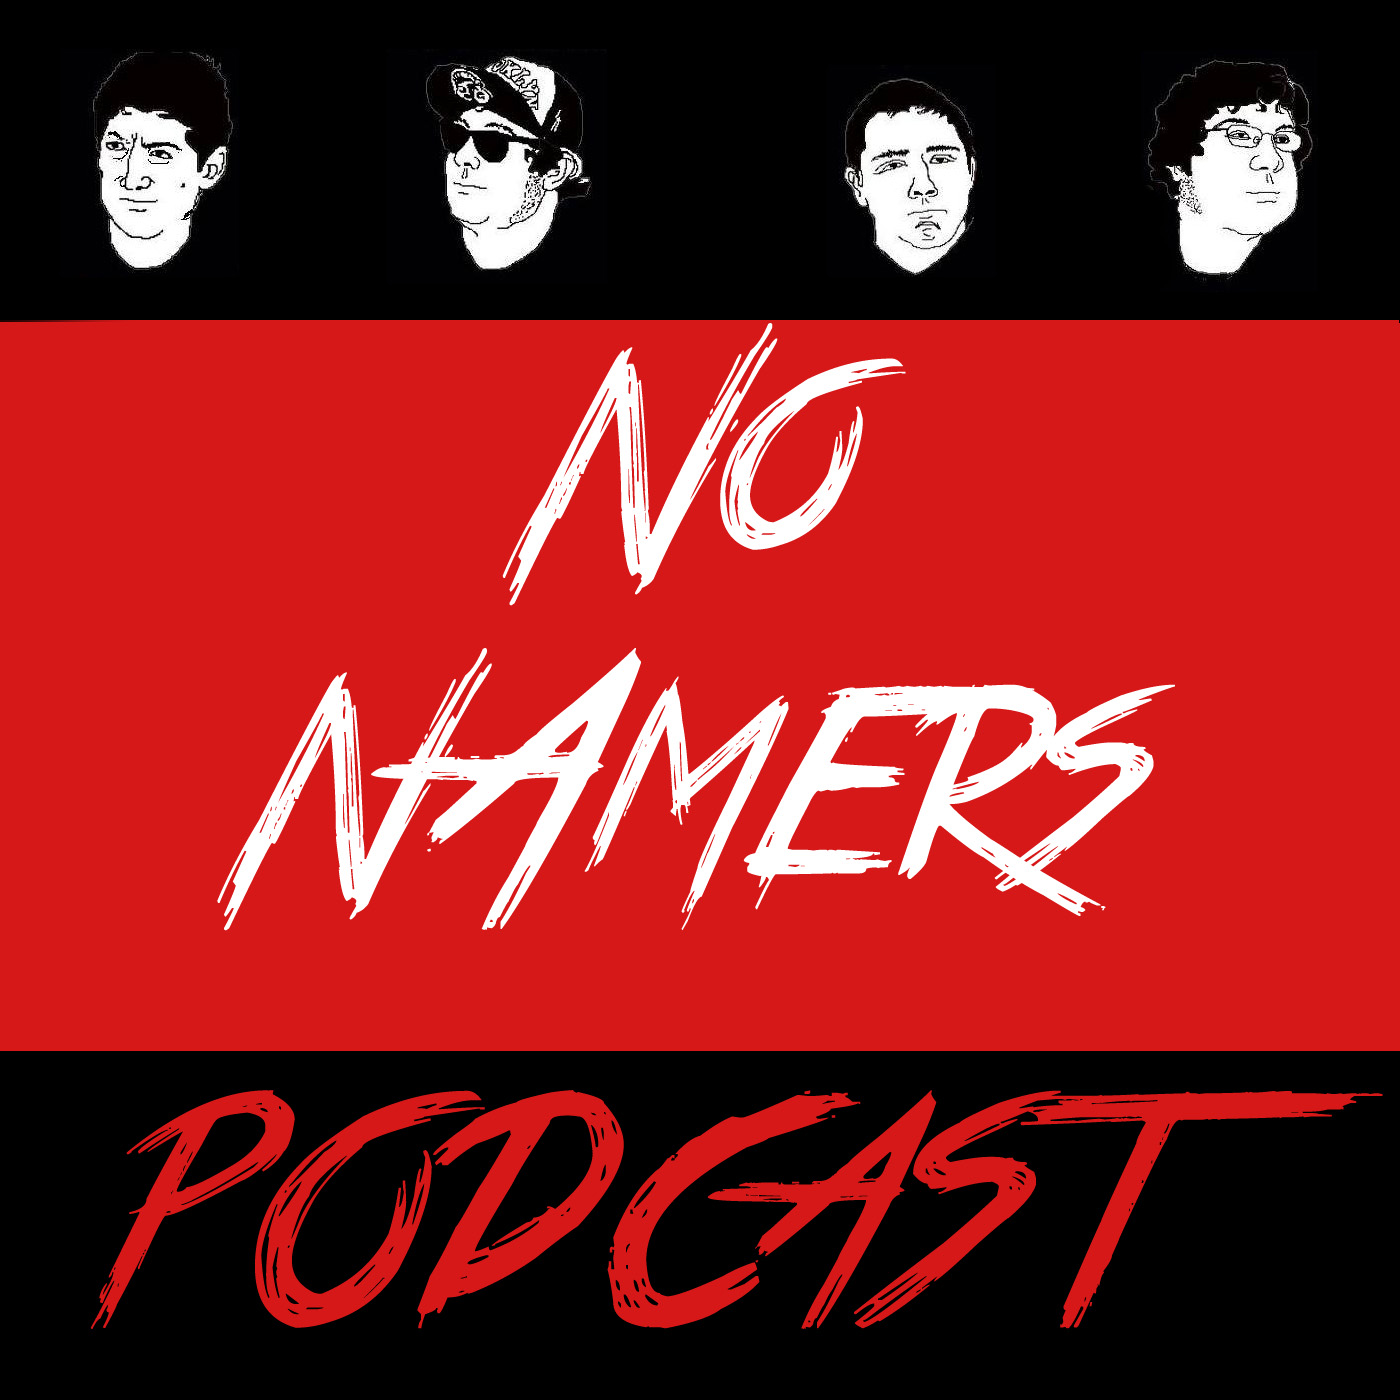 NoNamers podcast logo